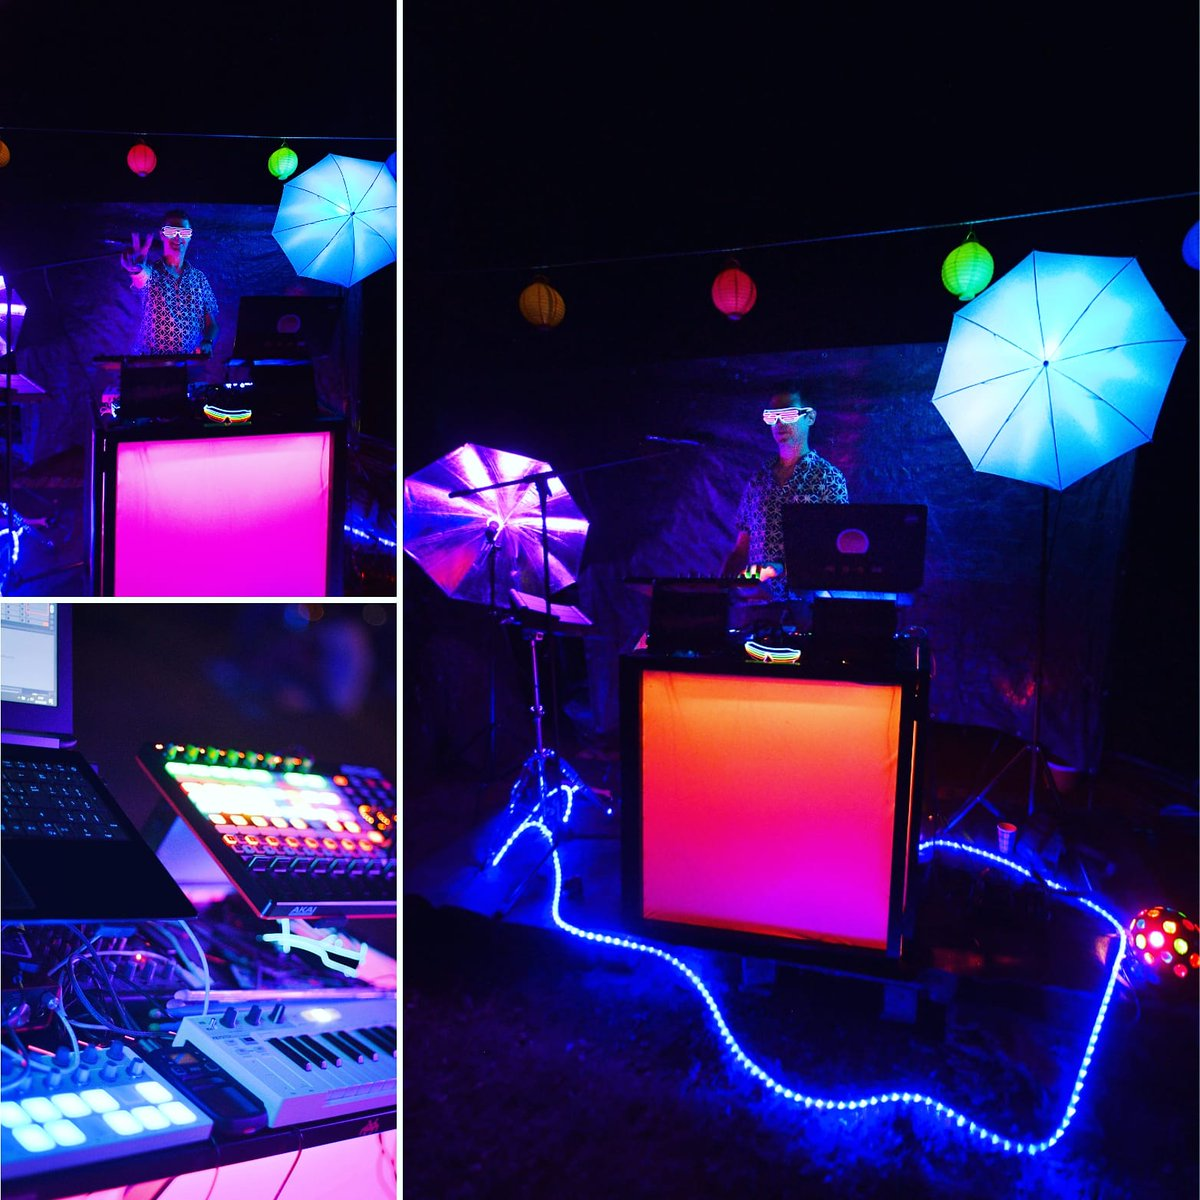 ...and suddenly the dream come true  · · #tousunislanuit #live #dj #synthwave #synthpop #retrowave #80s #cyberpunk #techno #djlife #mix #vaporwave #electropic.twitter.com/zIV6aXemPI